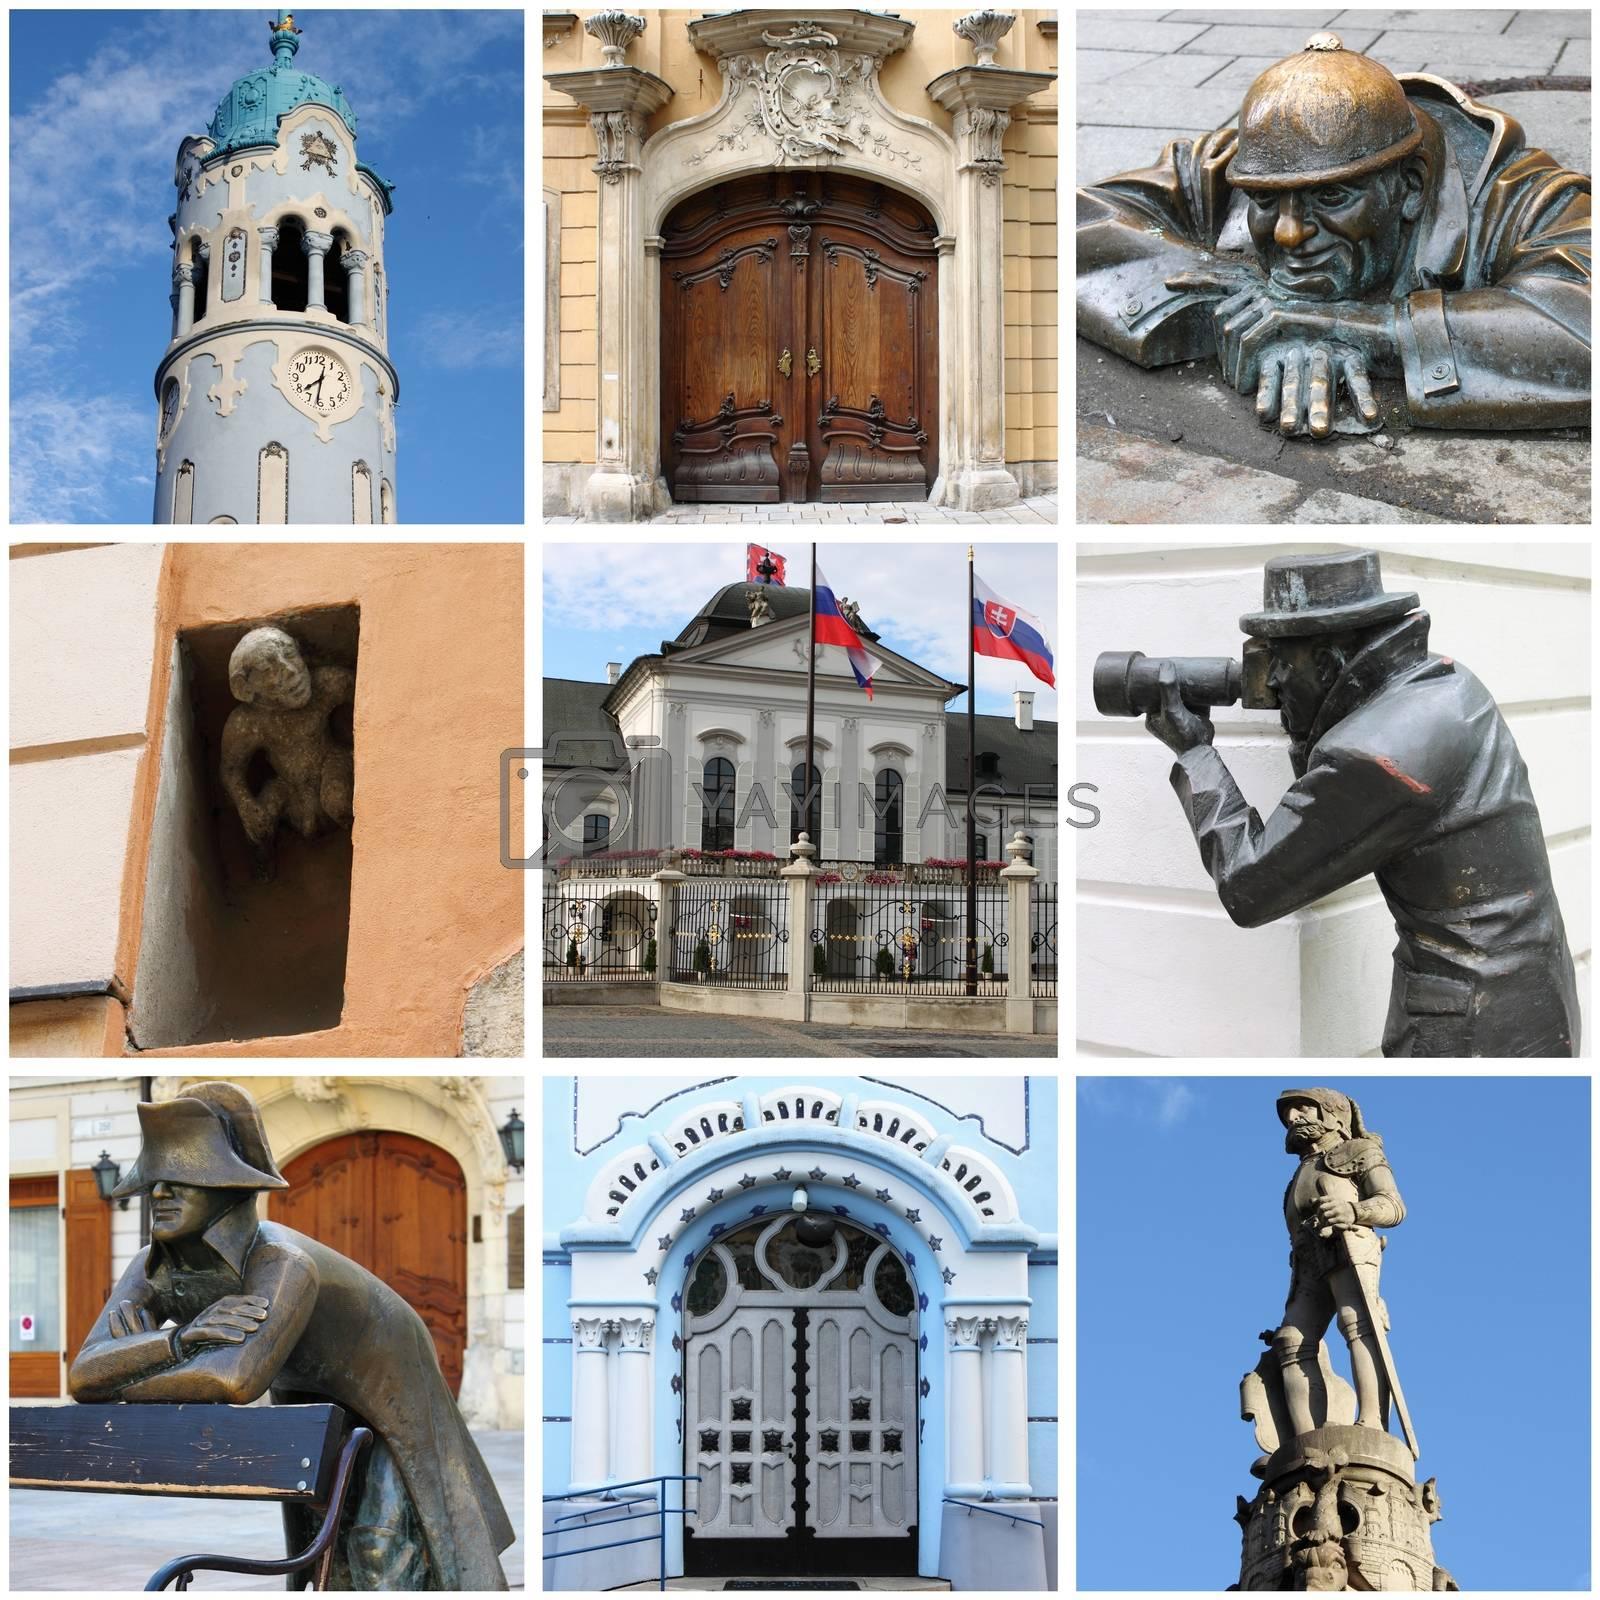 Bratislava landmarks collage by alessandro0770